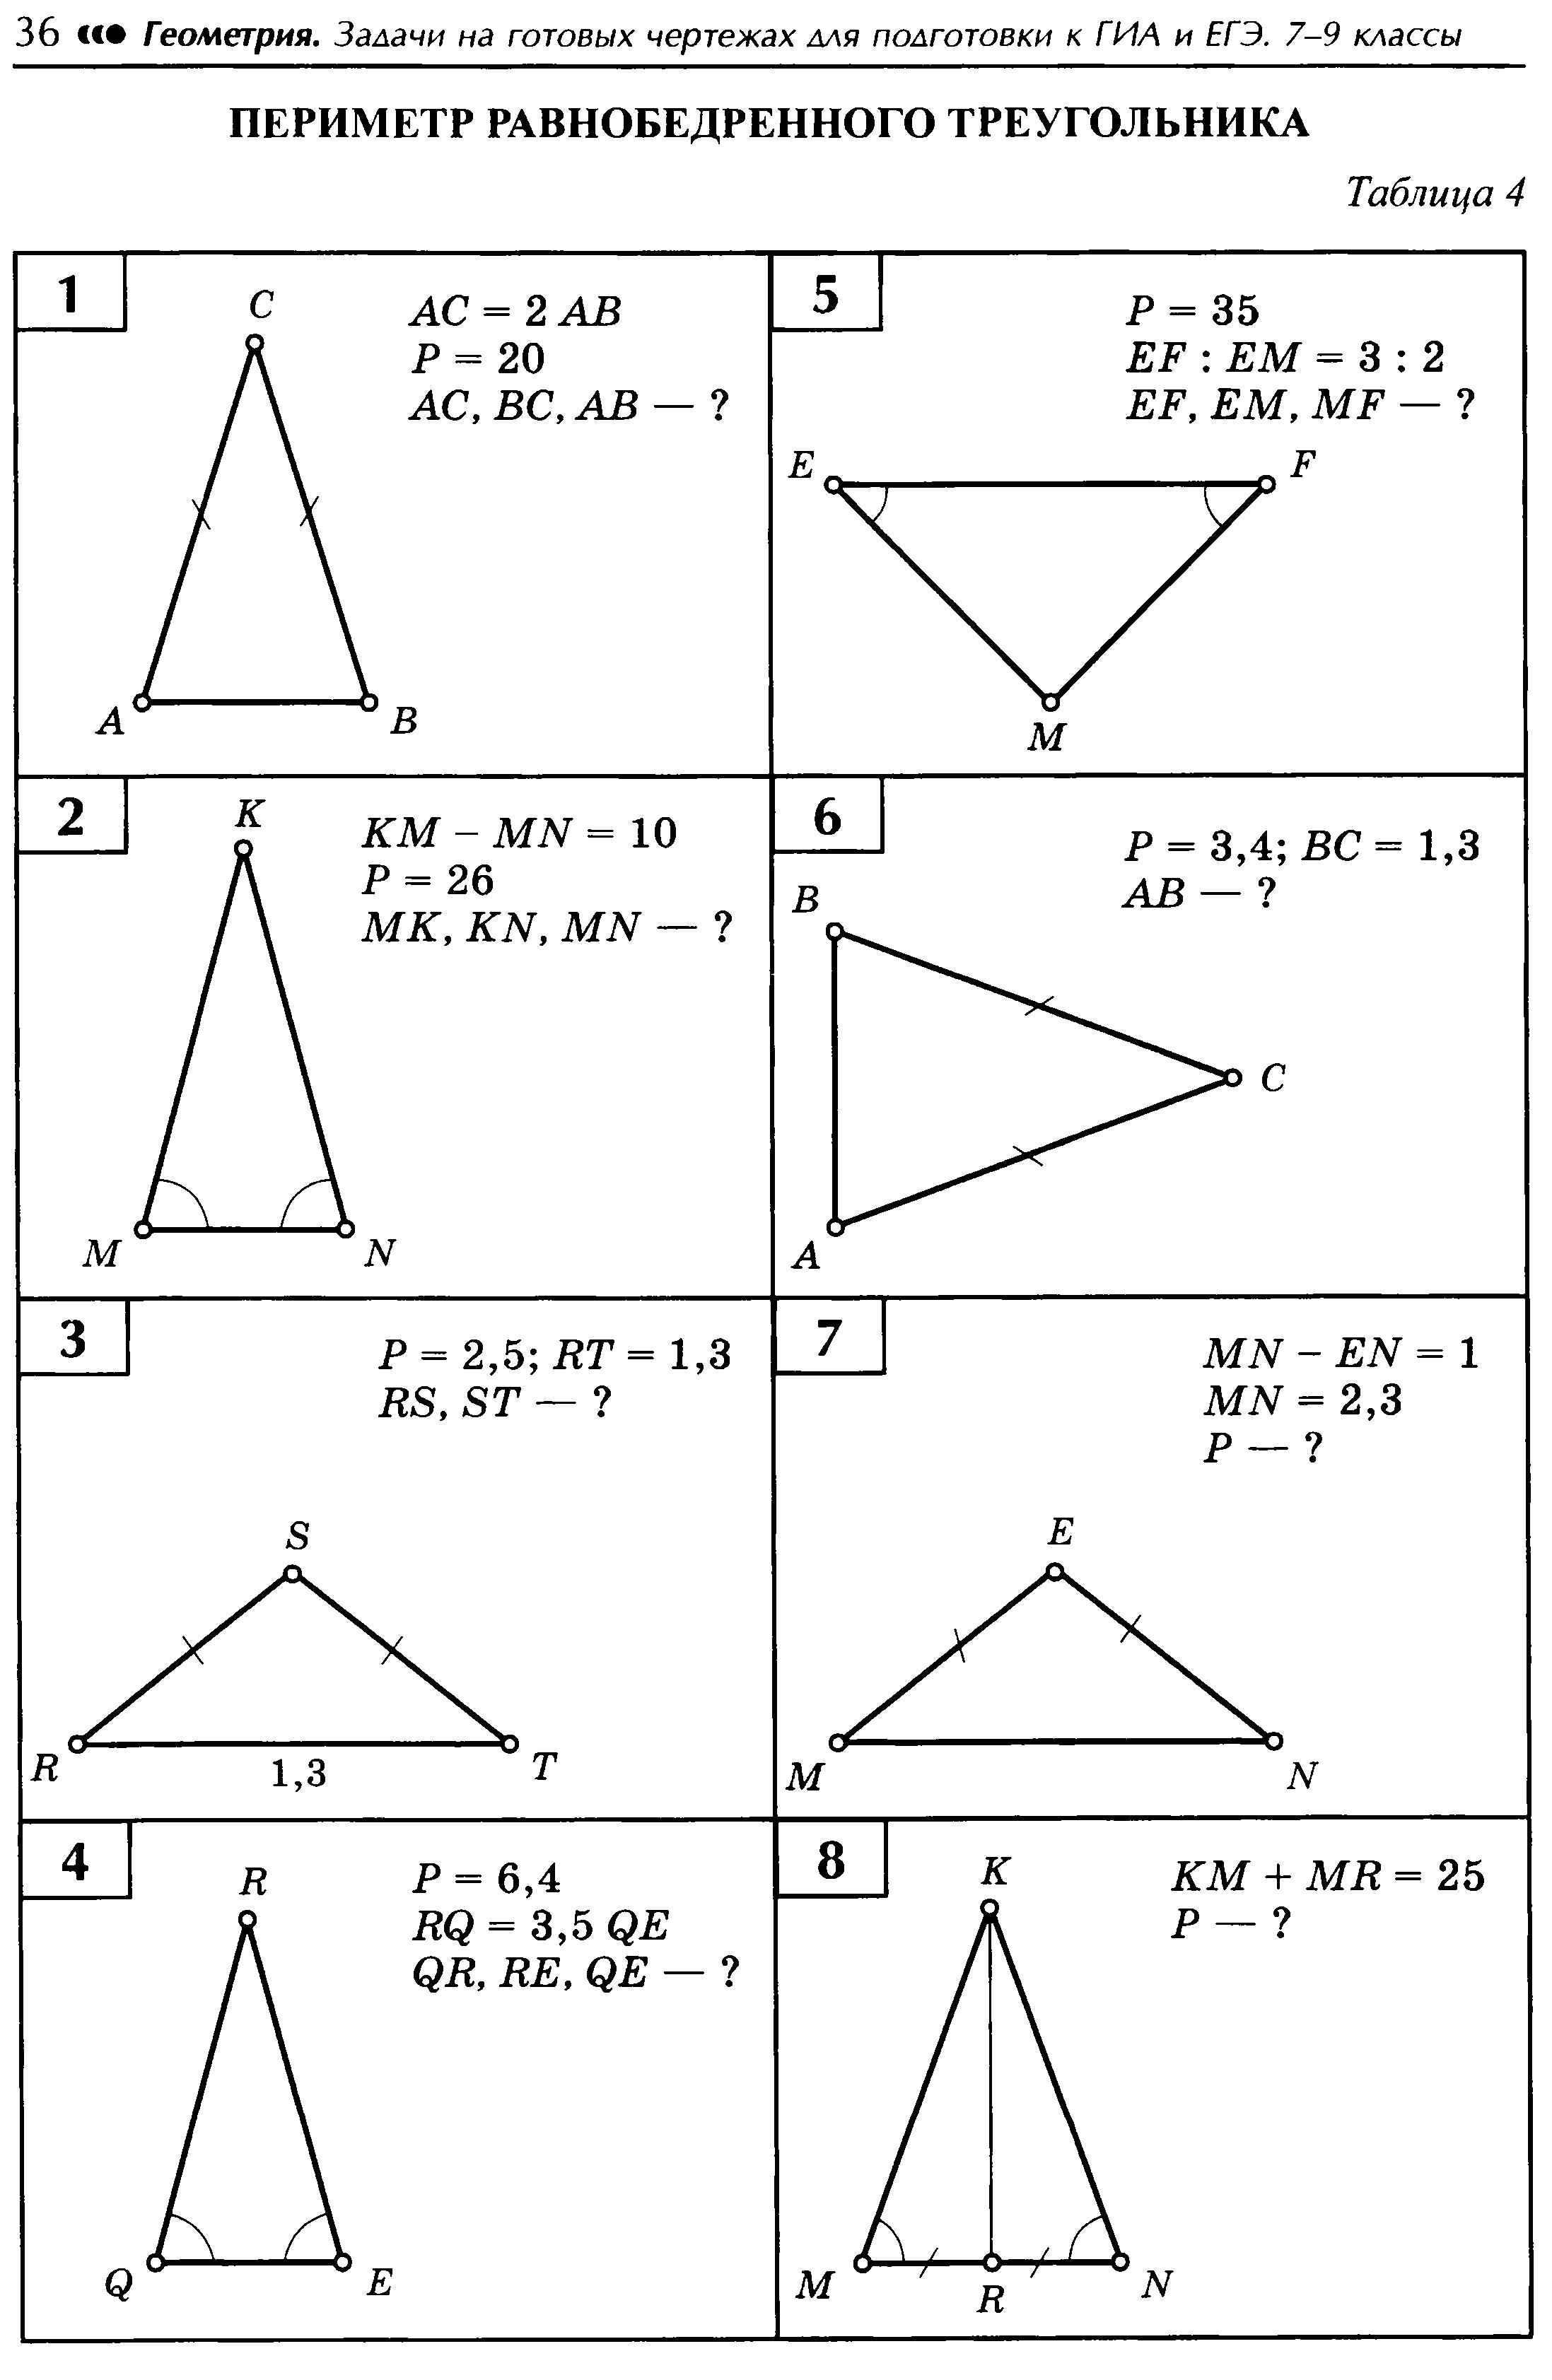 Решебник по геометрии в таблицах